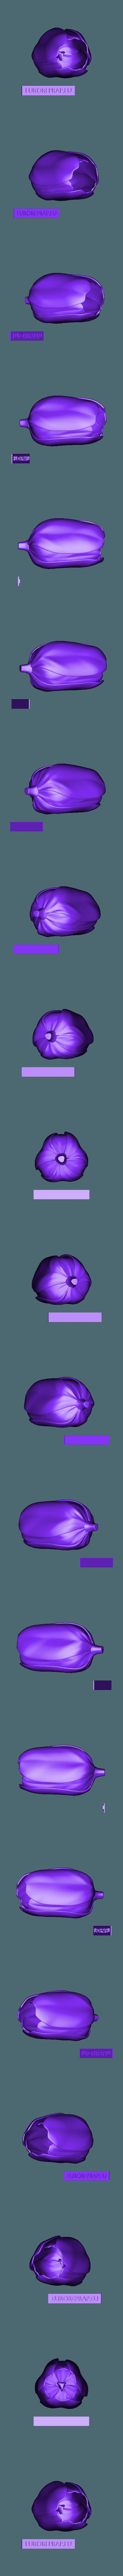 euroreprap_flower-tulip_b.stl Download STL file flowers: Tulip - 3D printable model • 3D printable design, euroreprap_eu